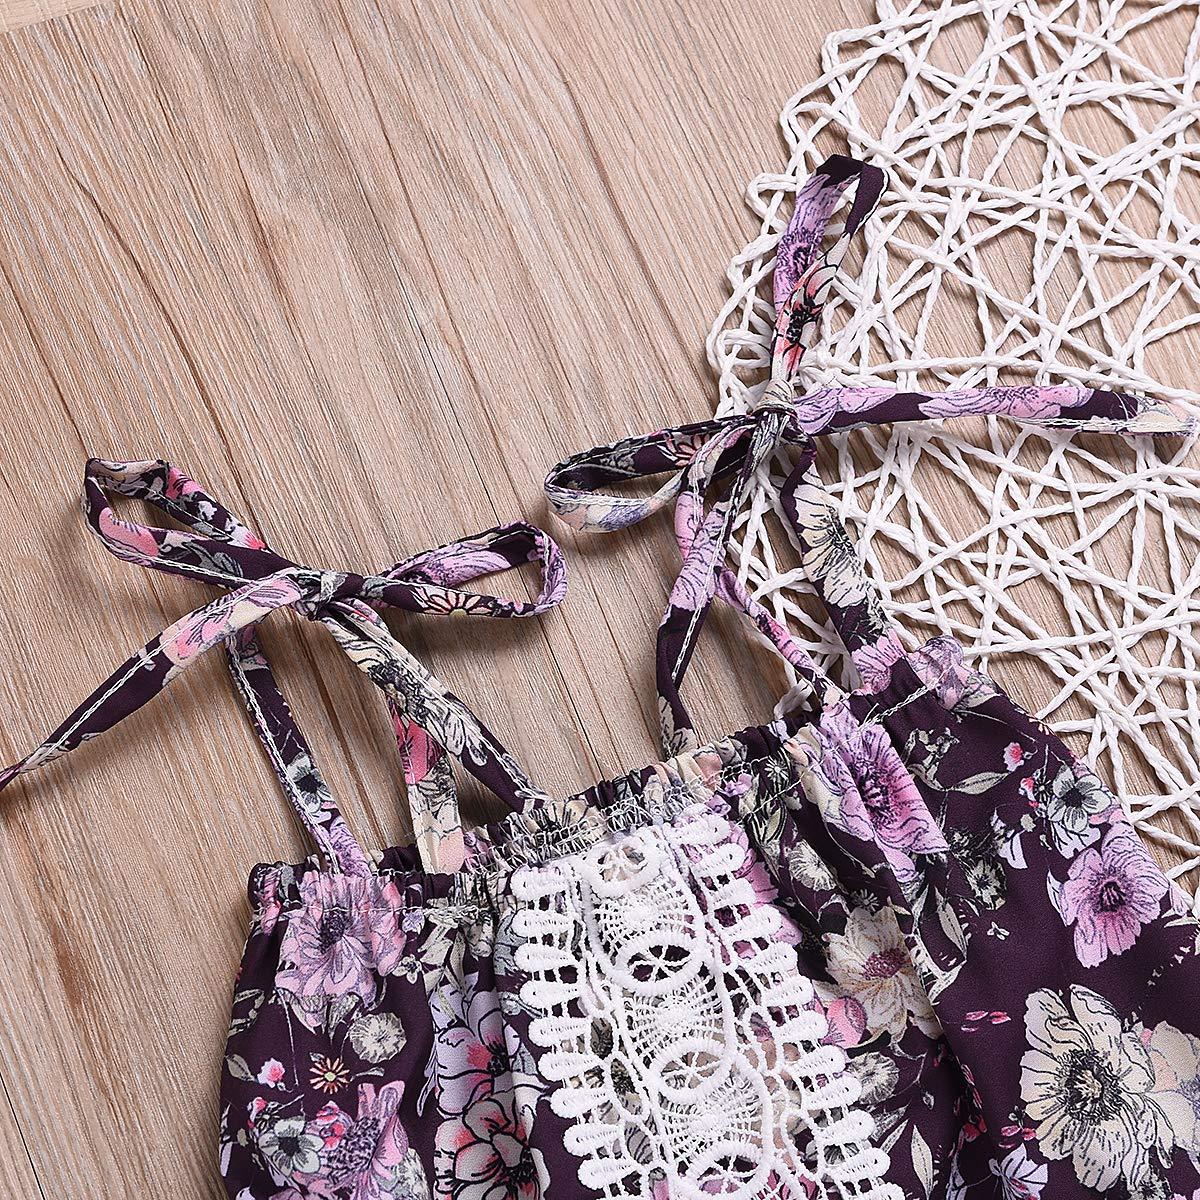 Little Baby Girls Strap Floral Tube Top Dress+Shorts Summer Sunsuit Outfit Set 2Pcs 0-5Y